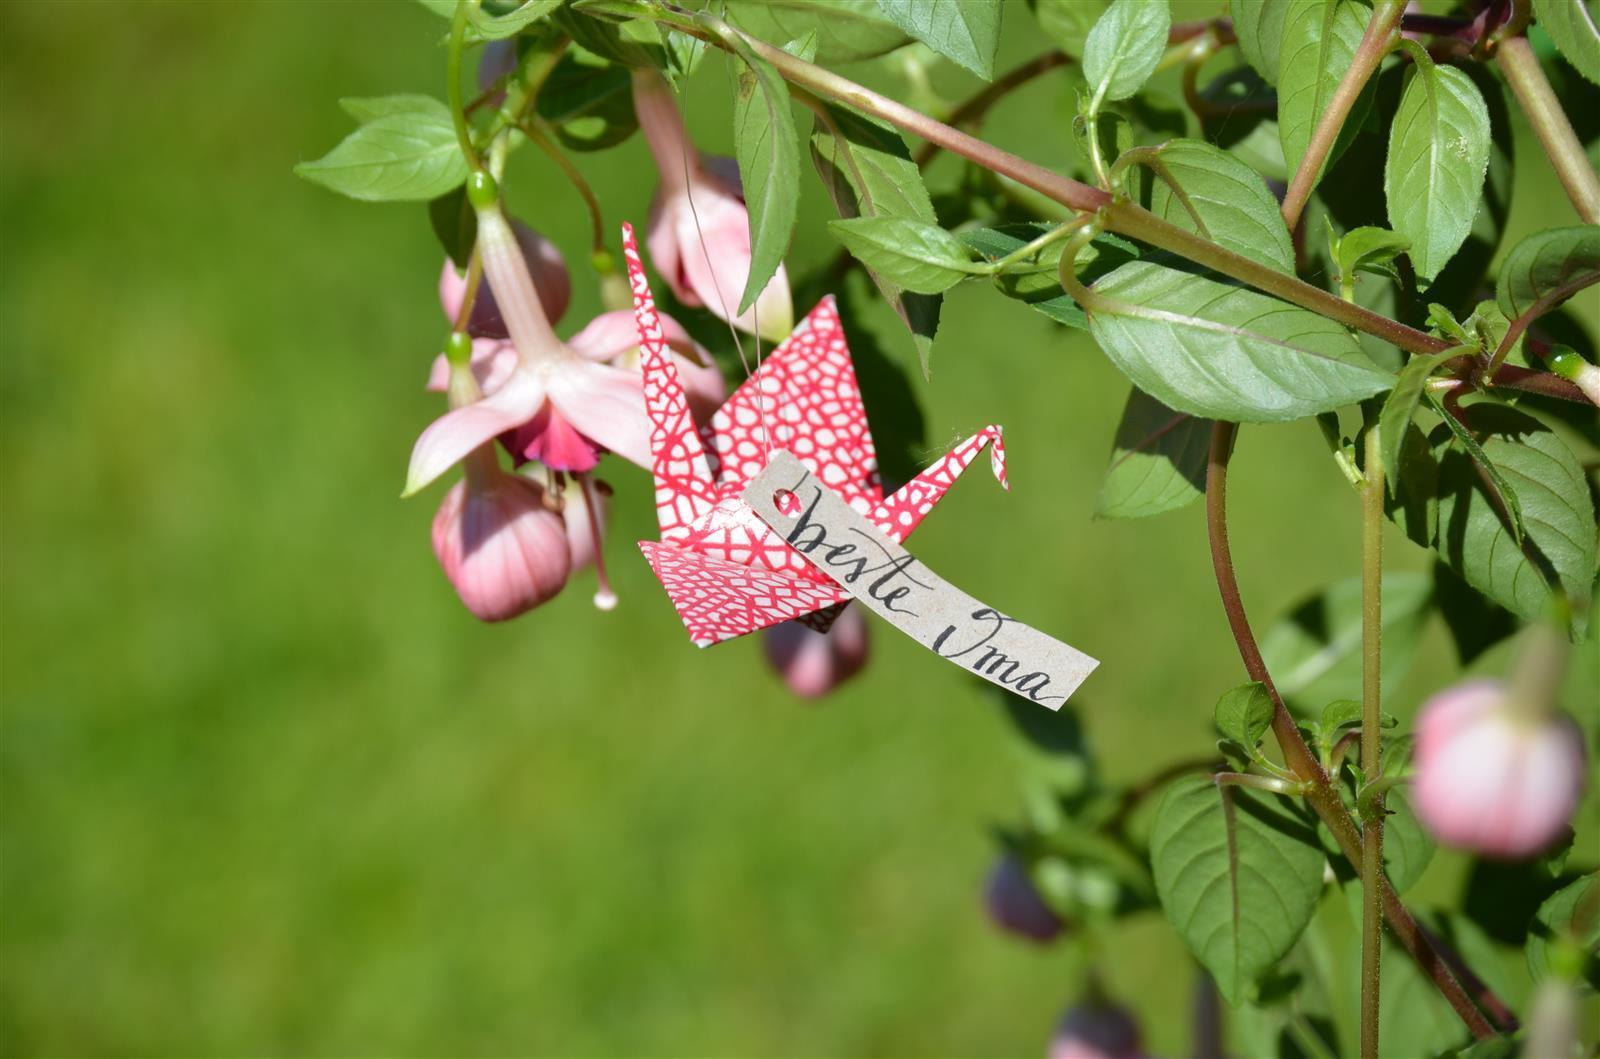 Origami-Kranich: rot gemustert, indiv. Schriftzug